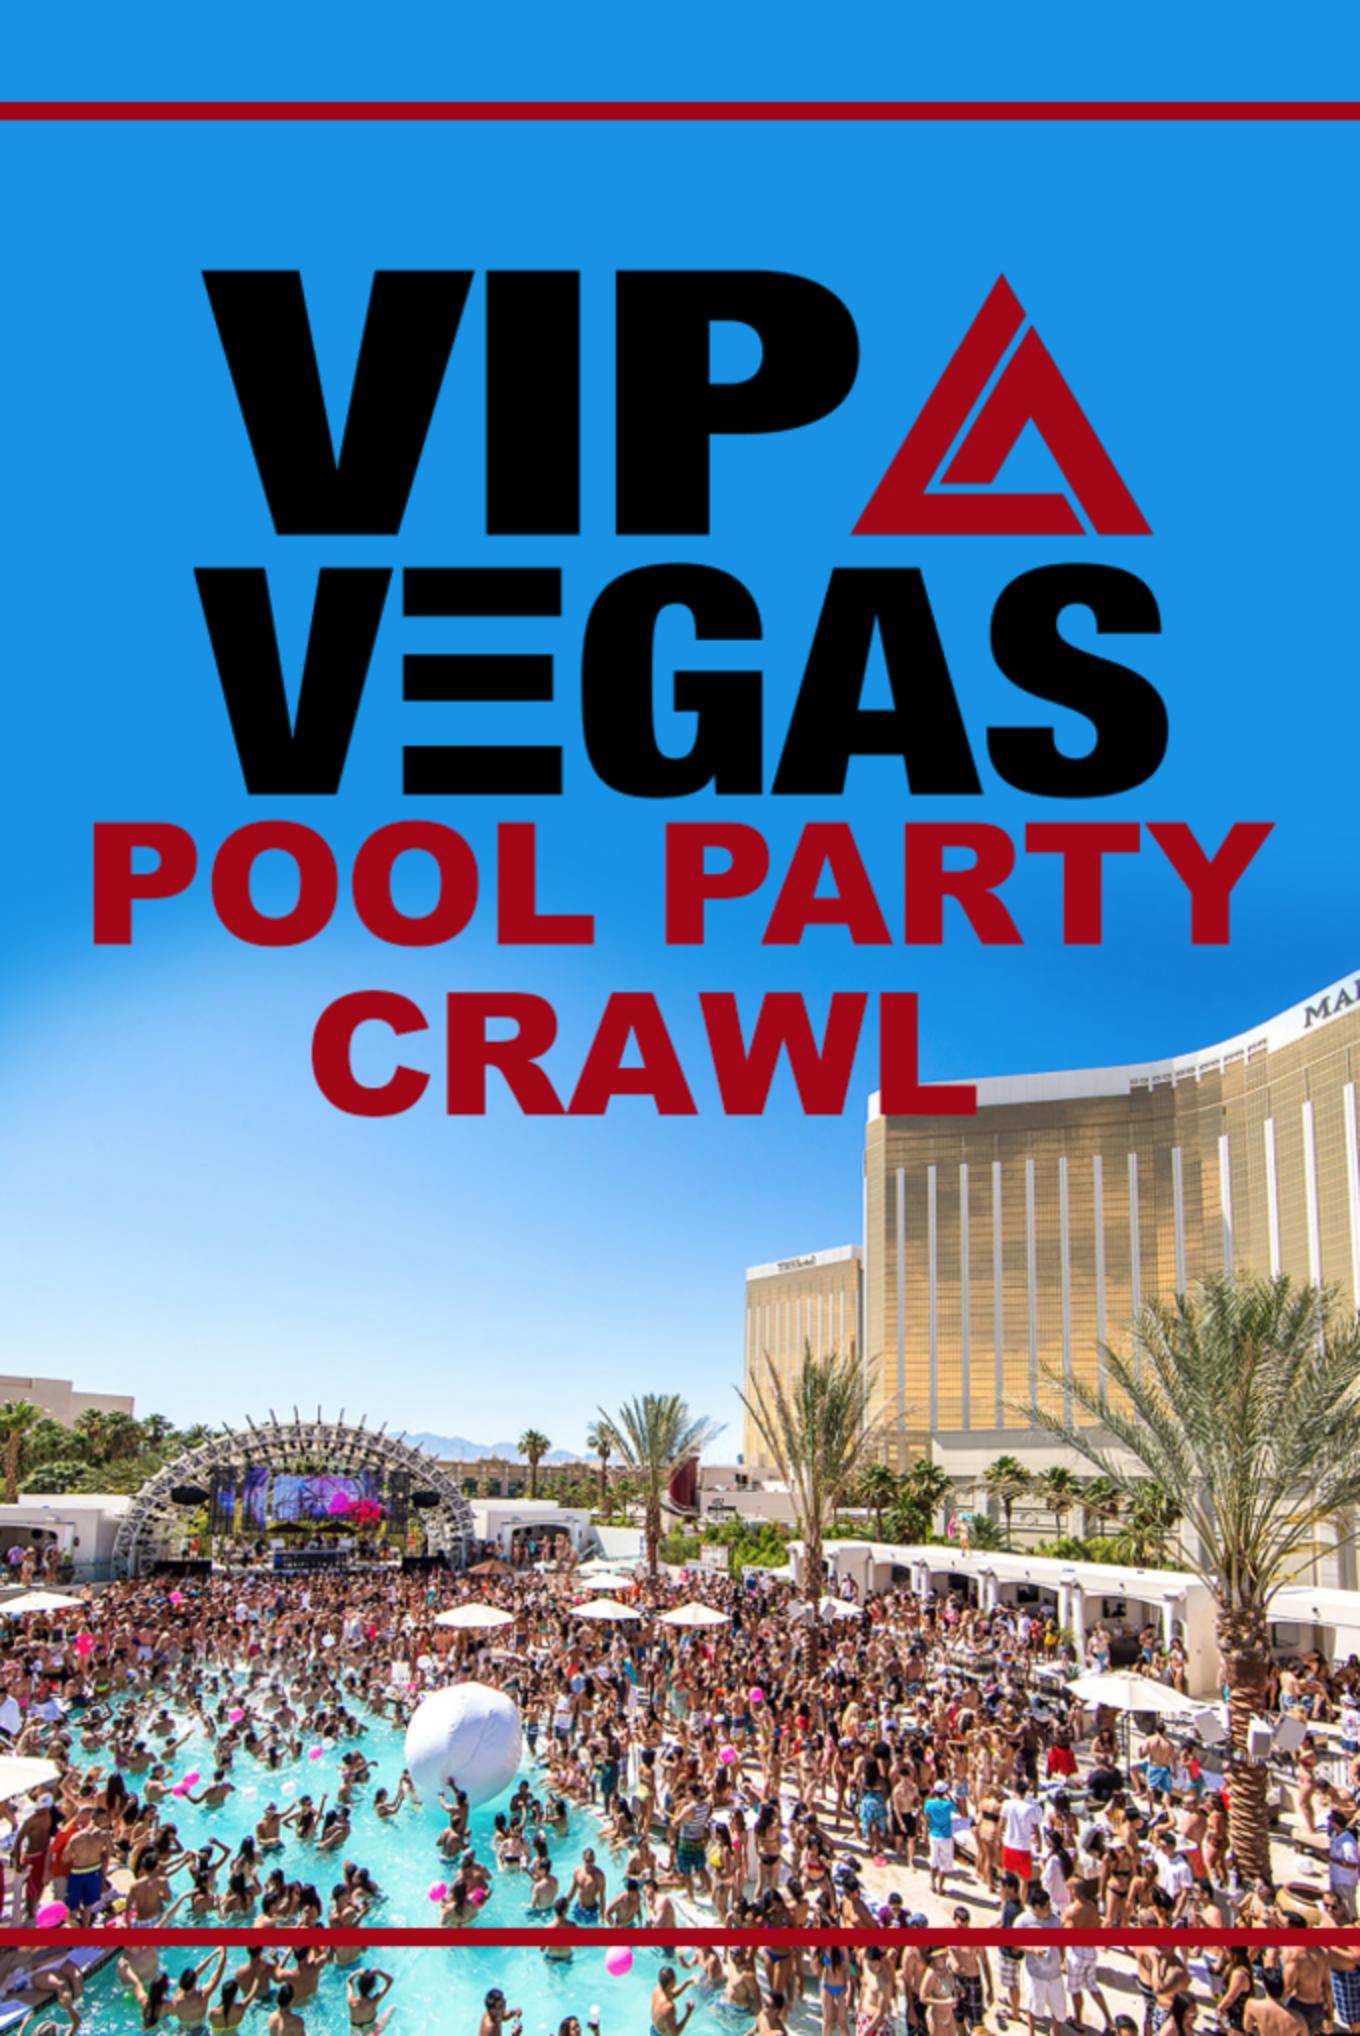 VIP Vegas Pool Party Crawl - Tickets - Las Vegas Strip , Las ...